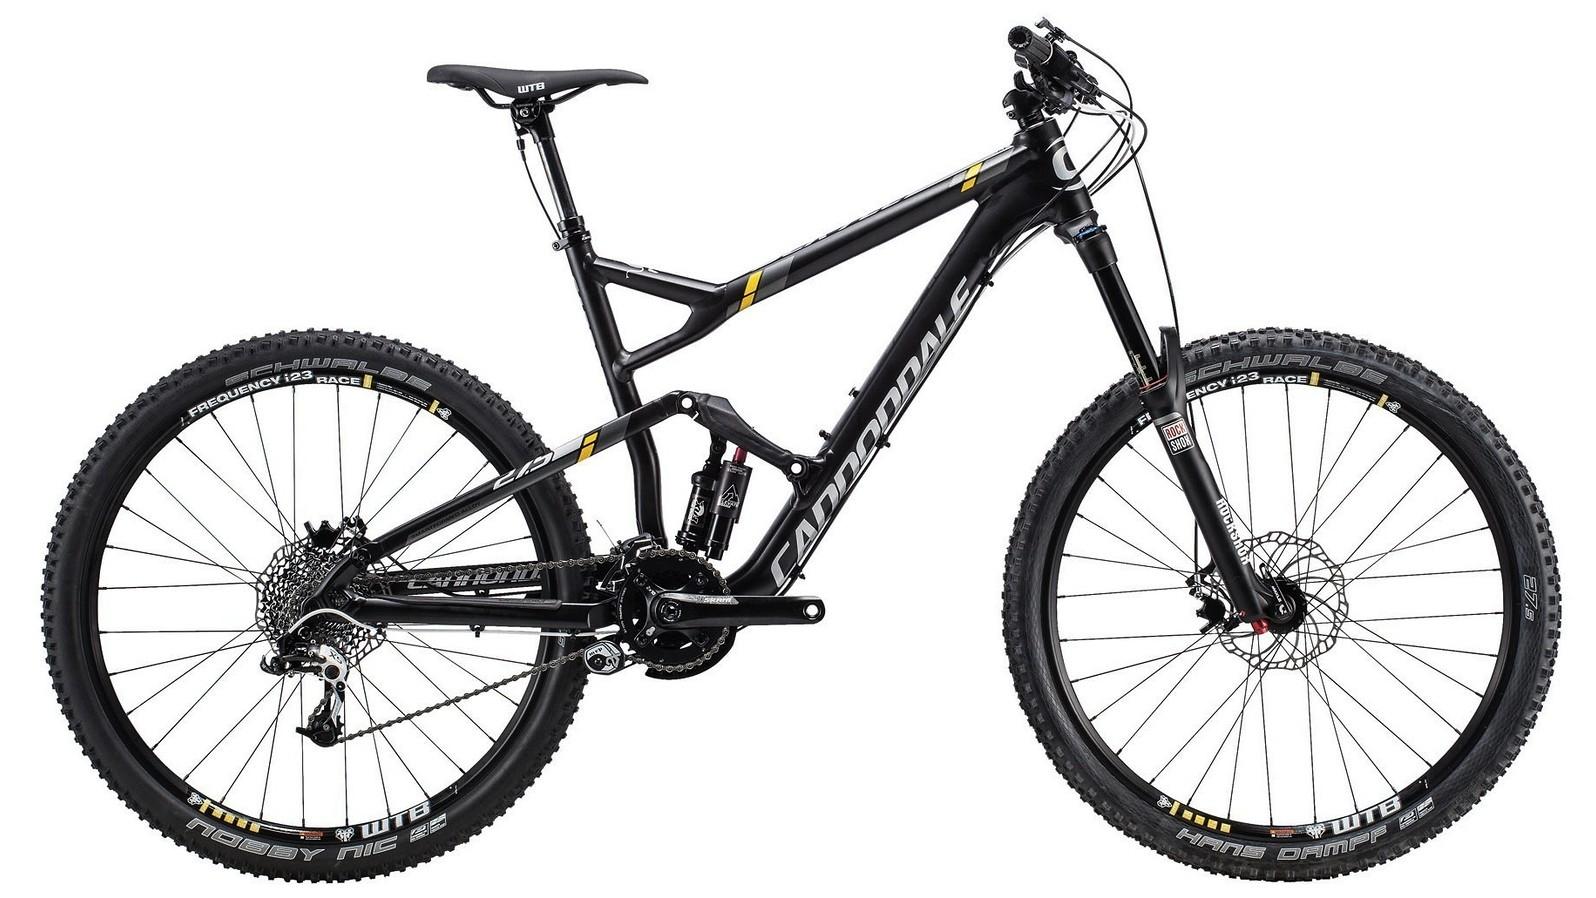 2015 Cannondale Jekyll 27.5 3 Bike